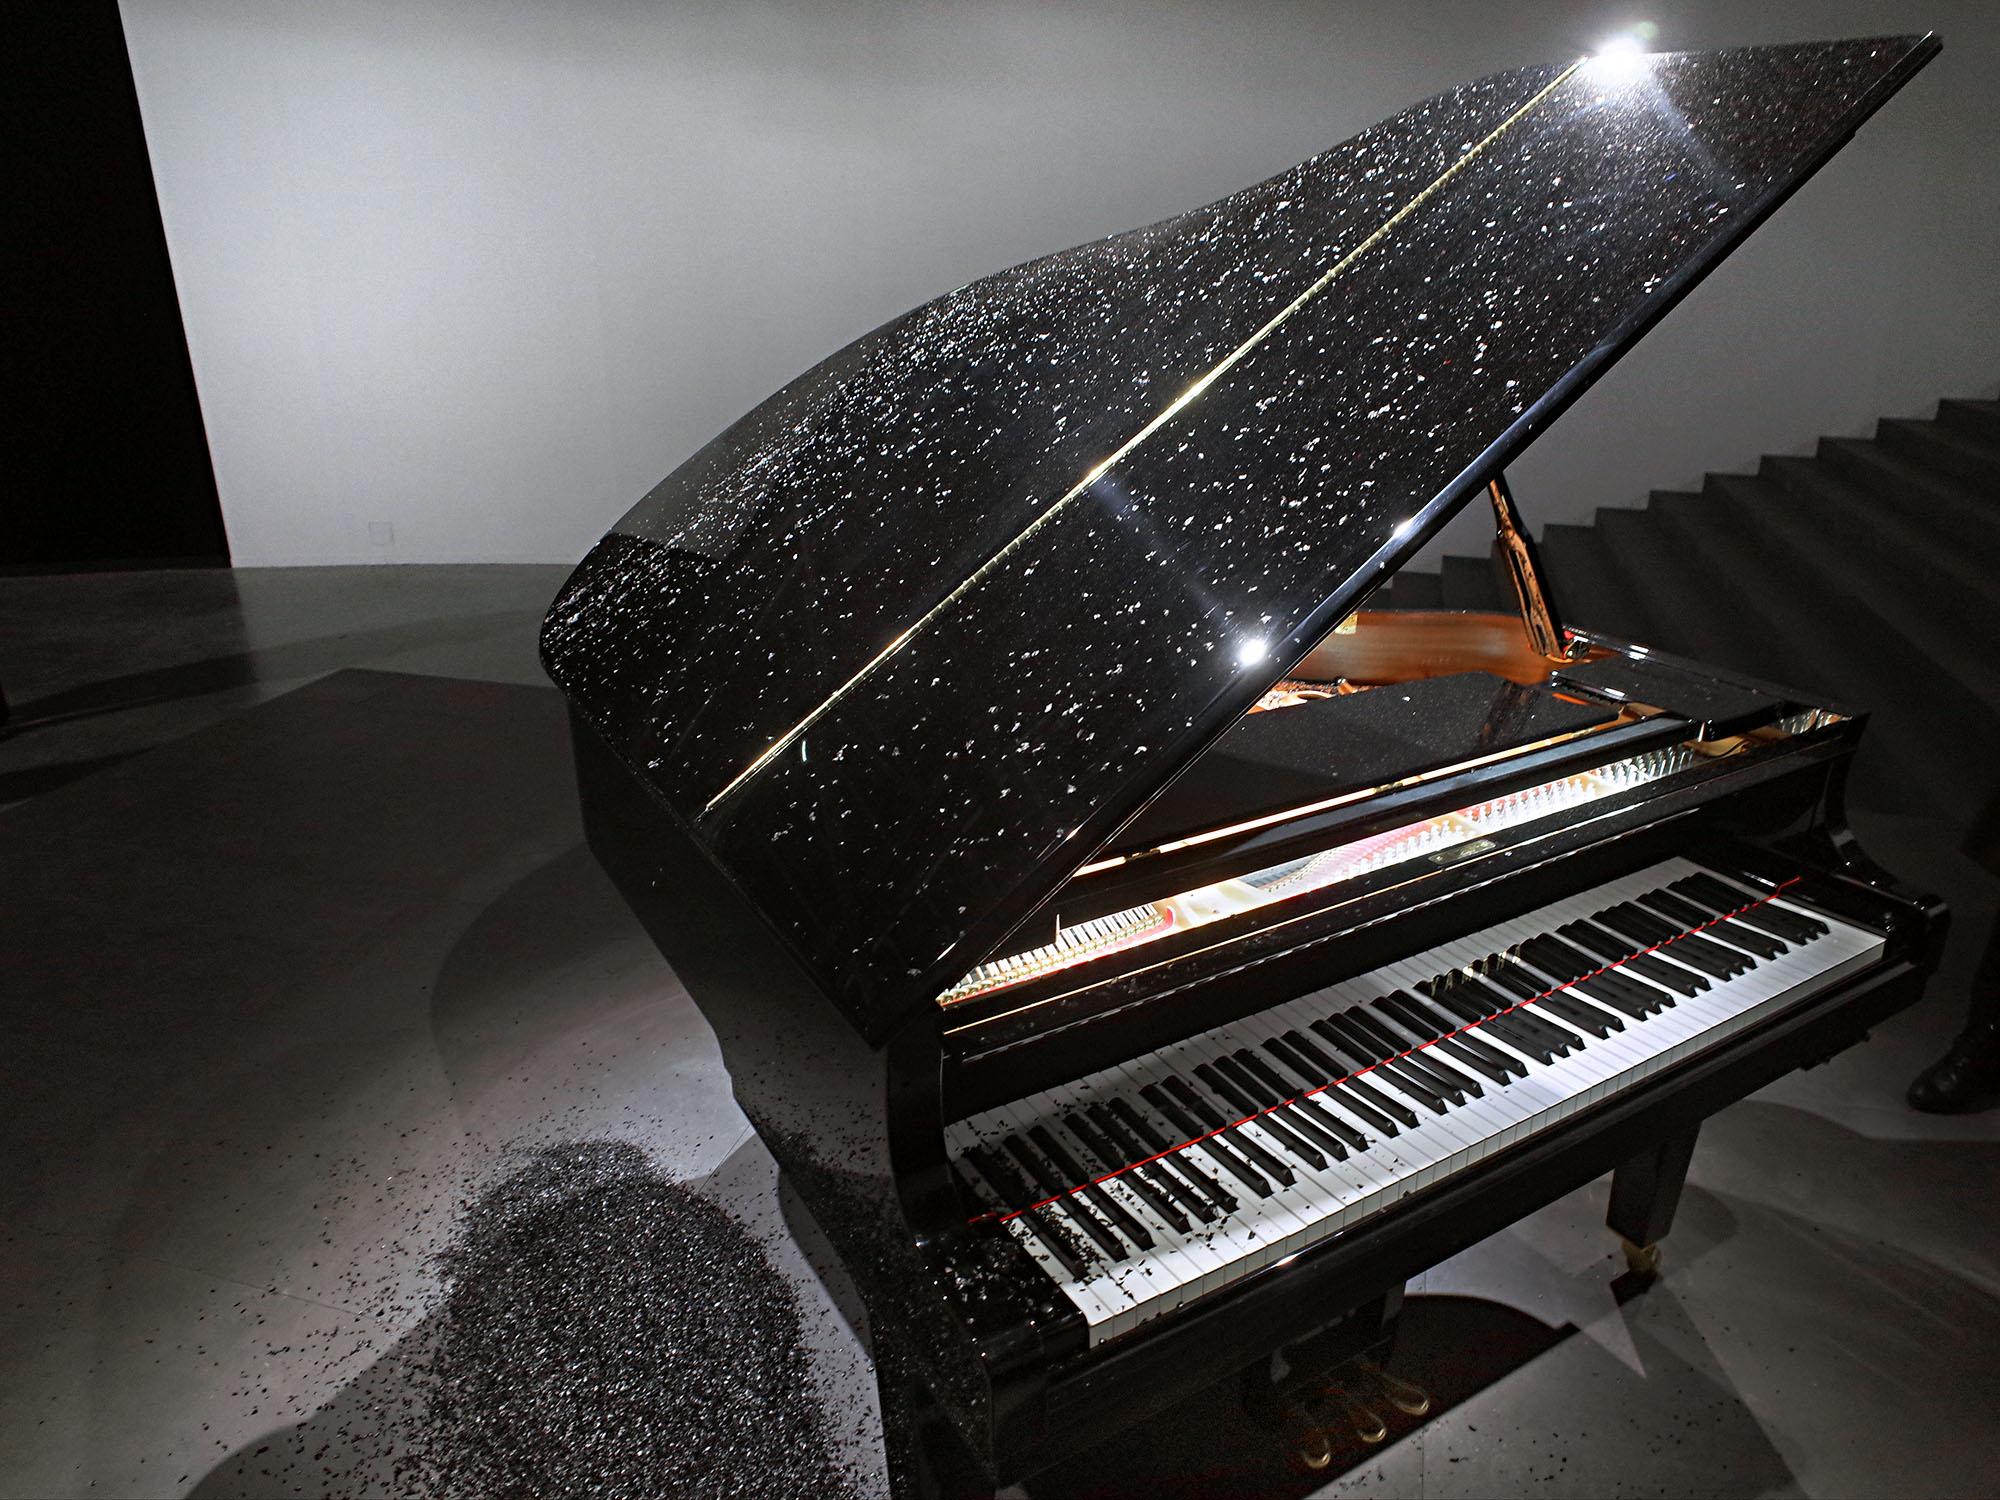 parreno piano neige clavier